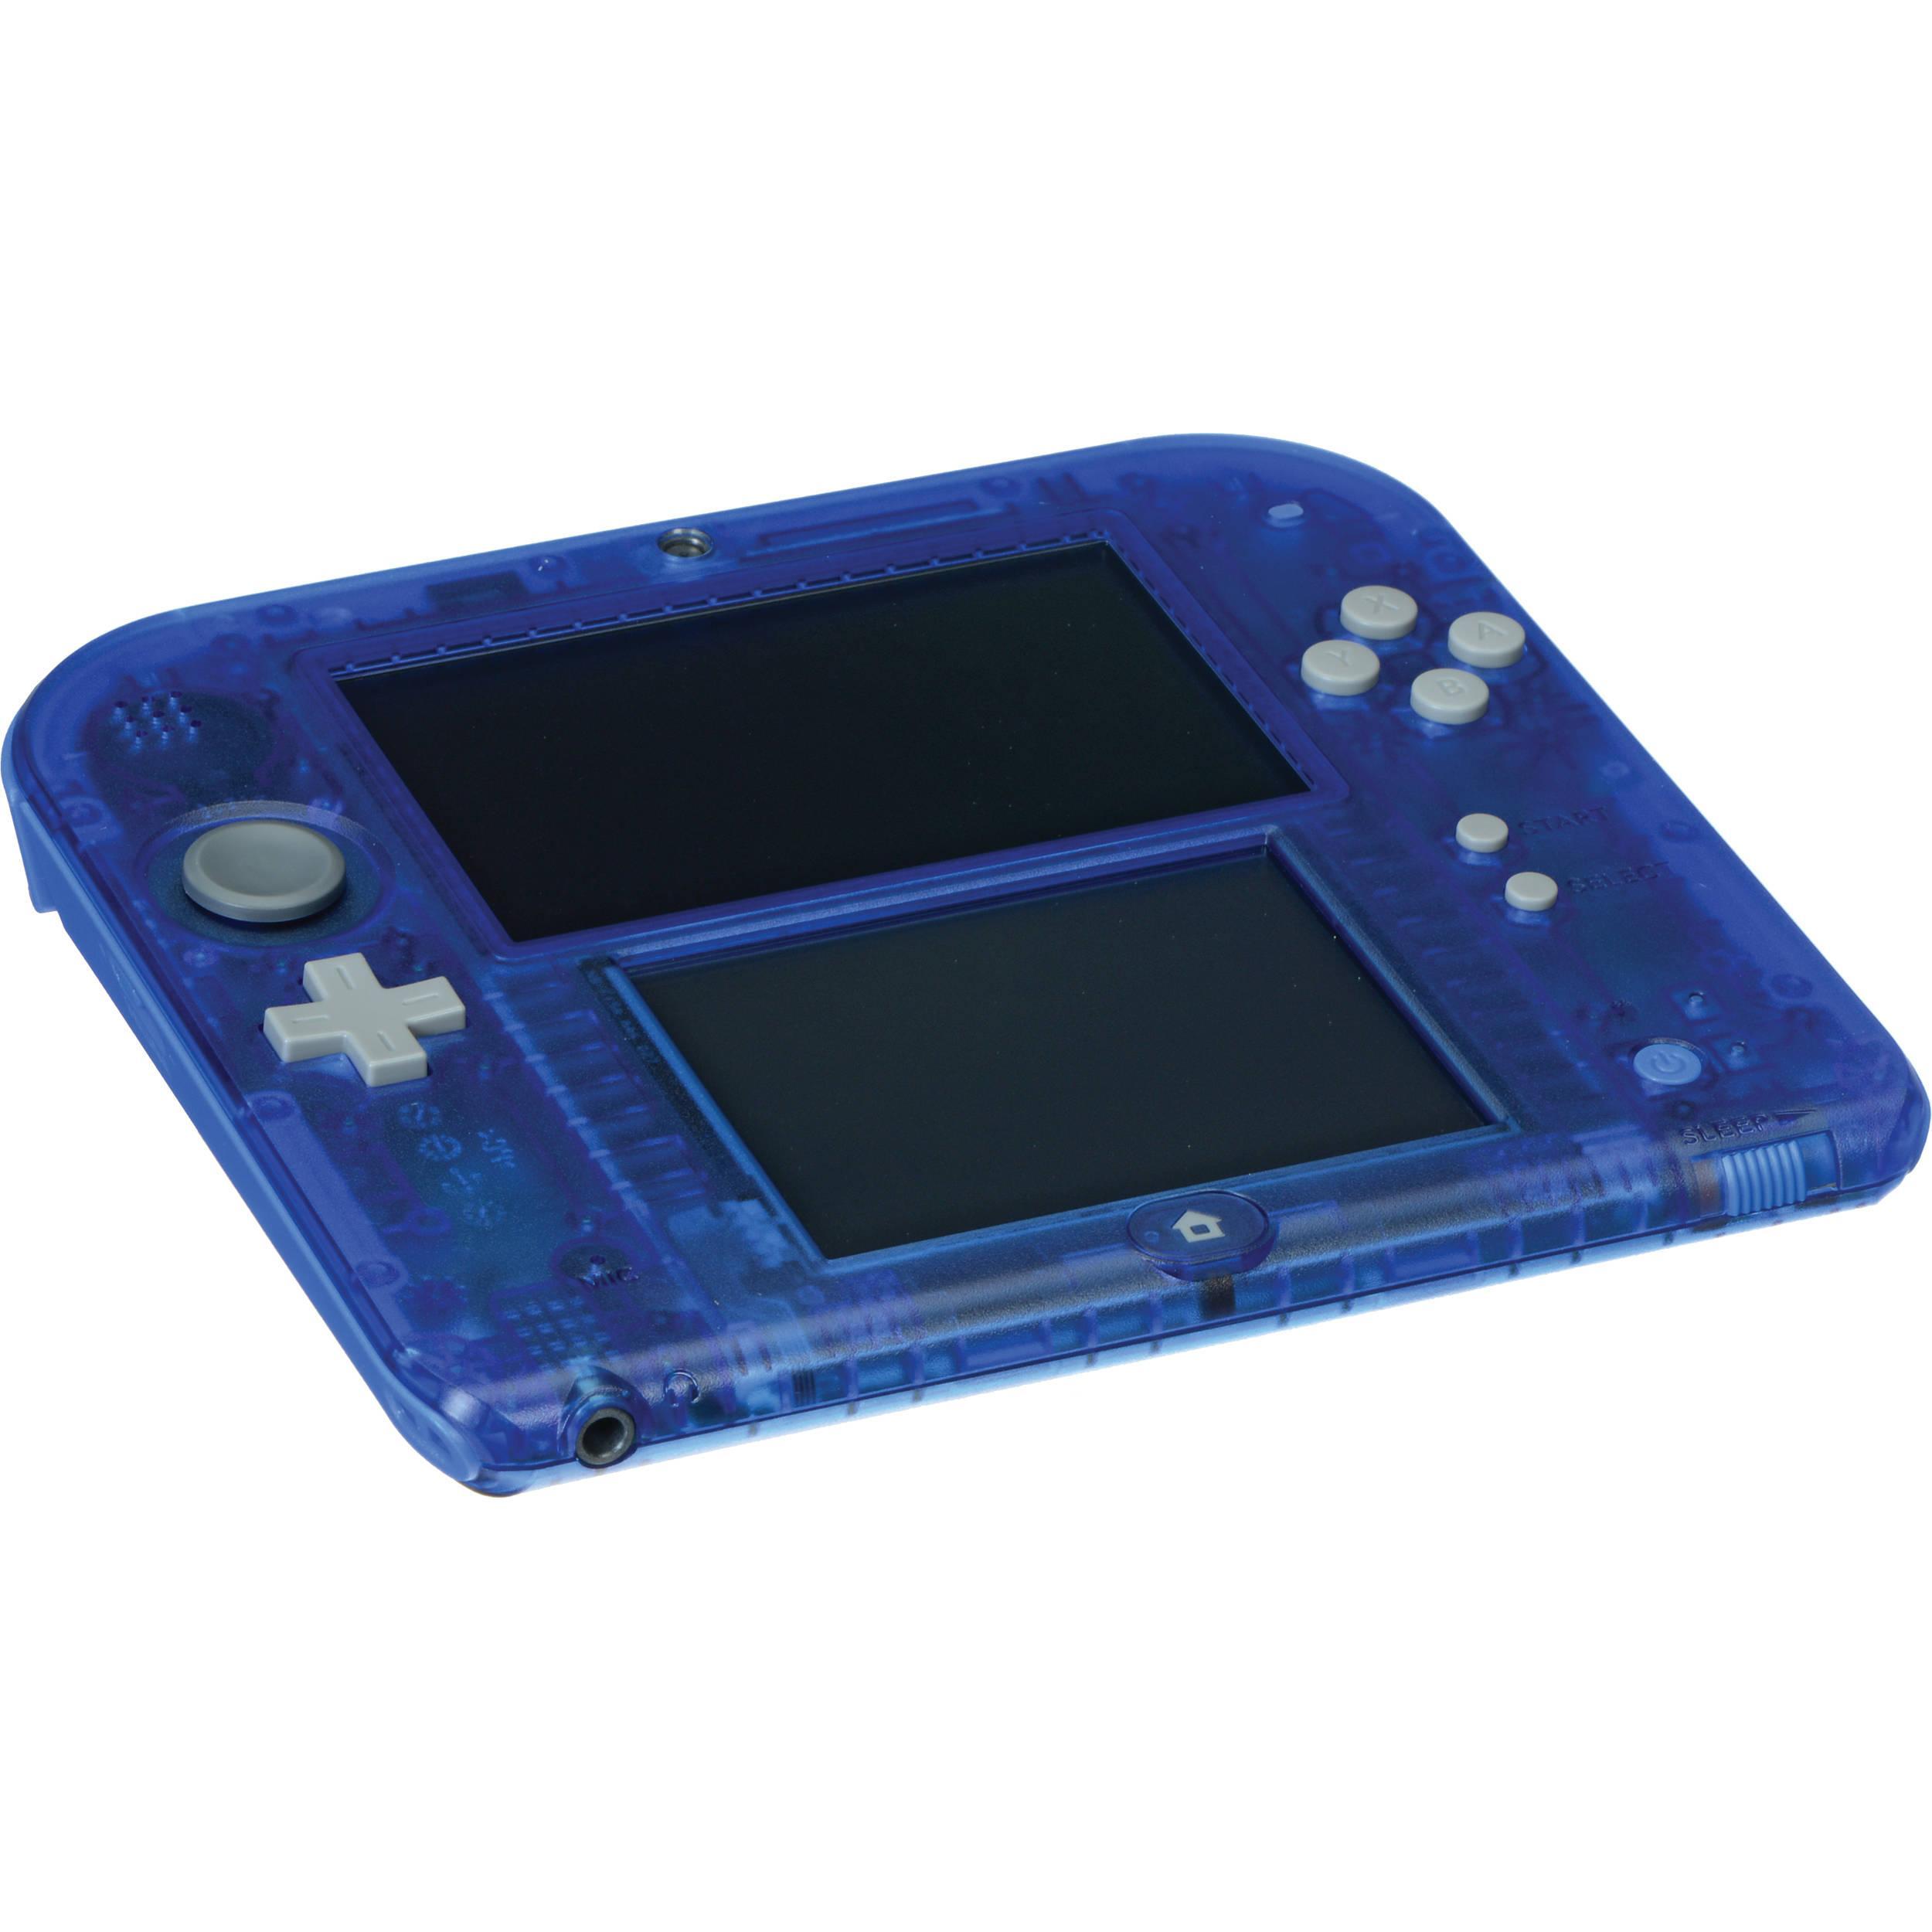 Nintendo 2DS - HDD 0 MB - Modrá